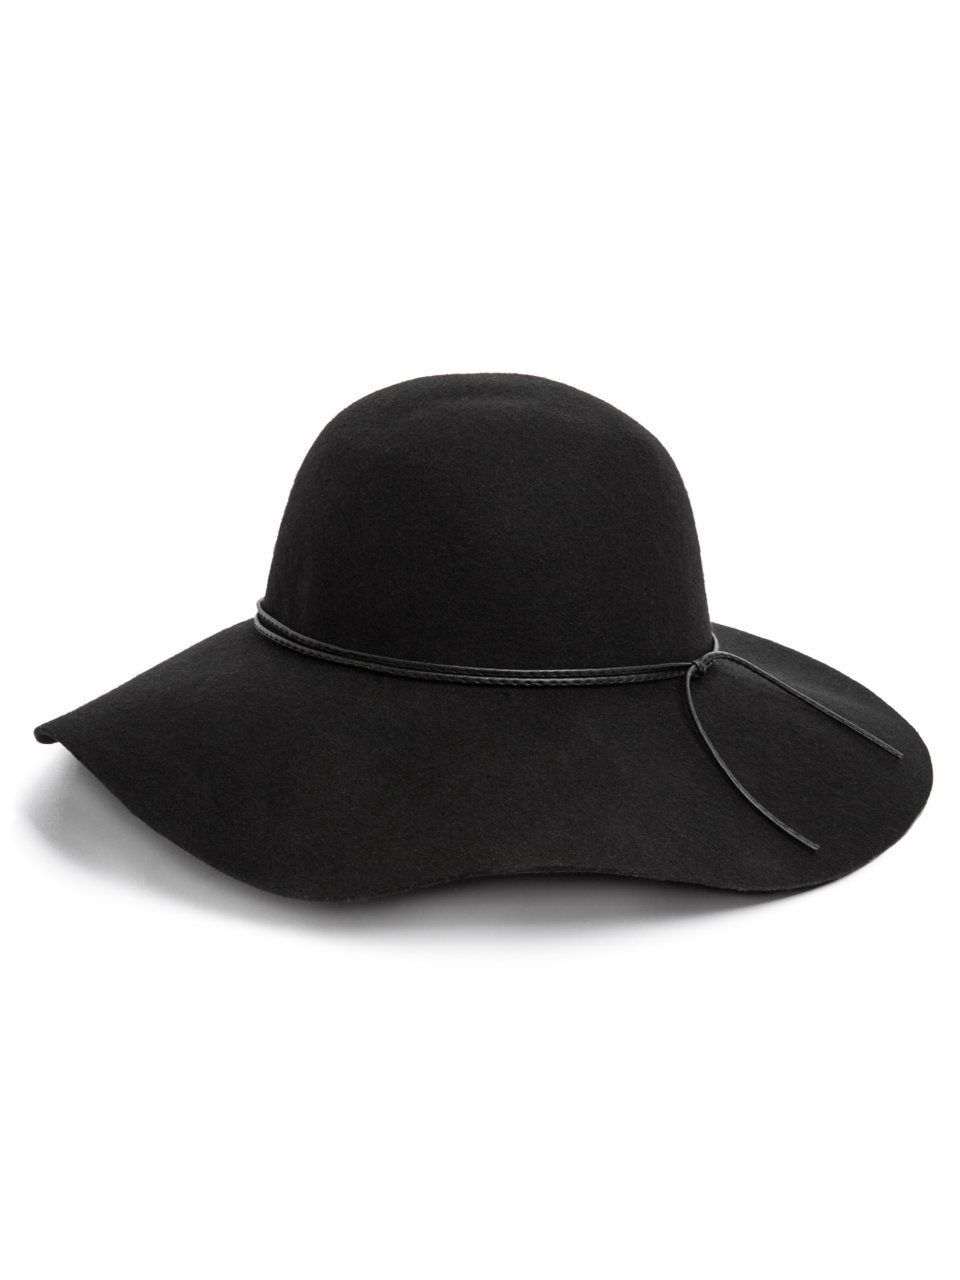 GUESS Wide-Brim Felt Hat, BLACK